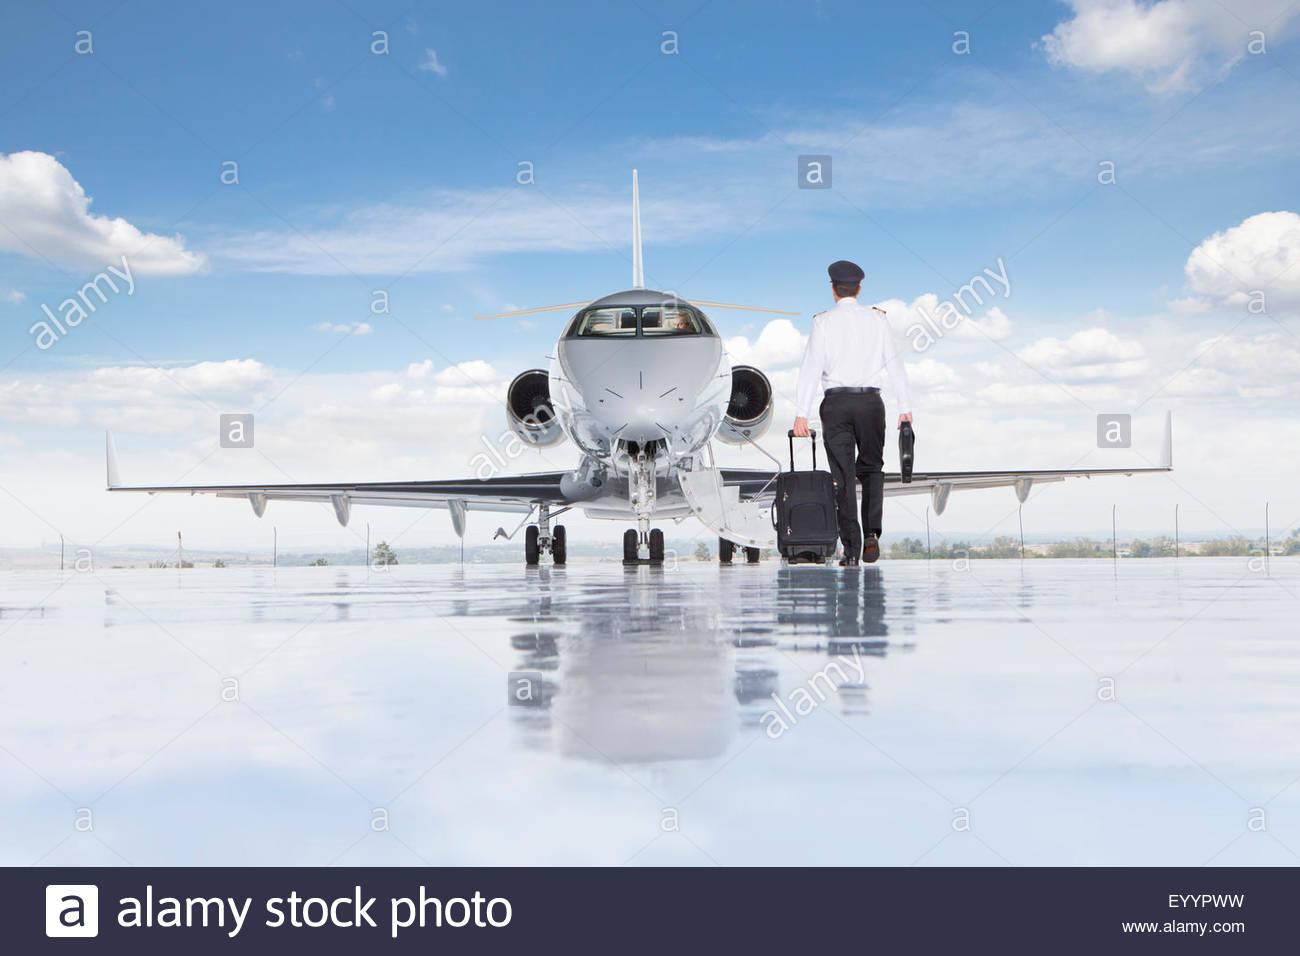 Pilot walking towards private jet - Stock Image